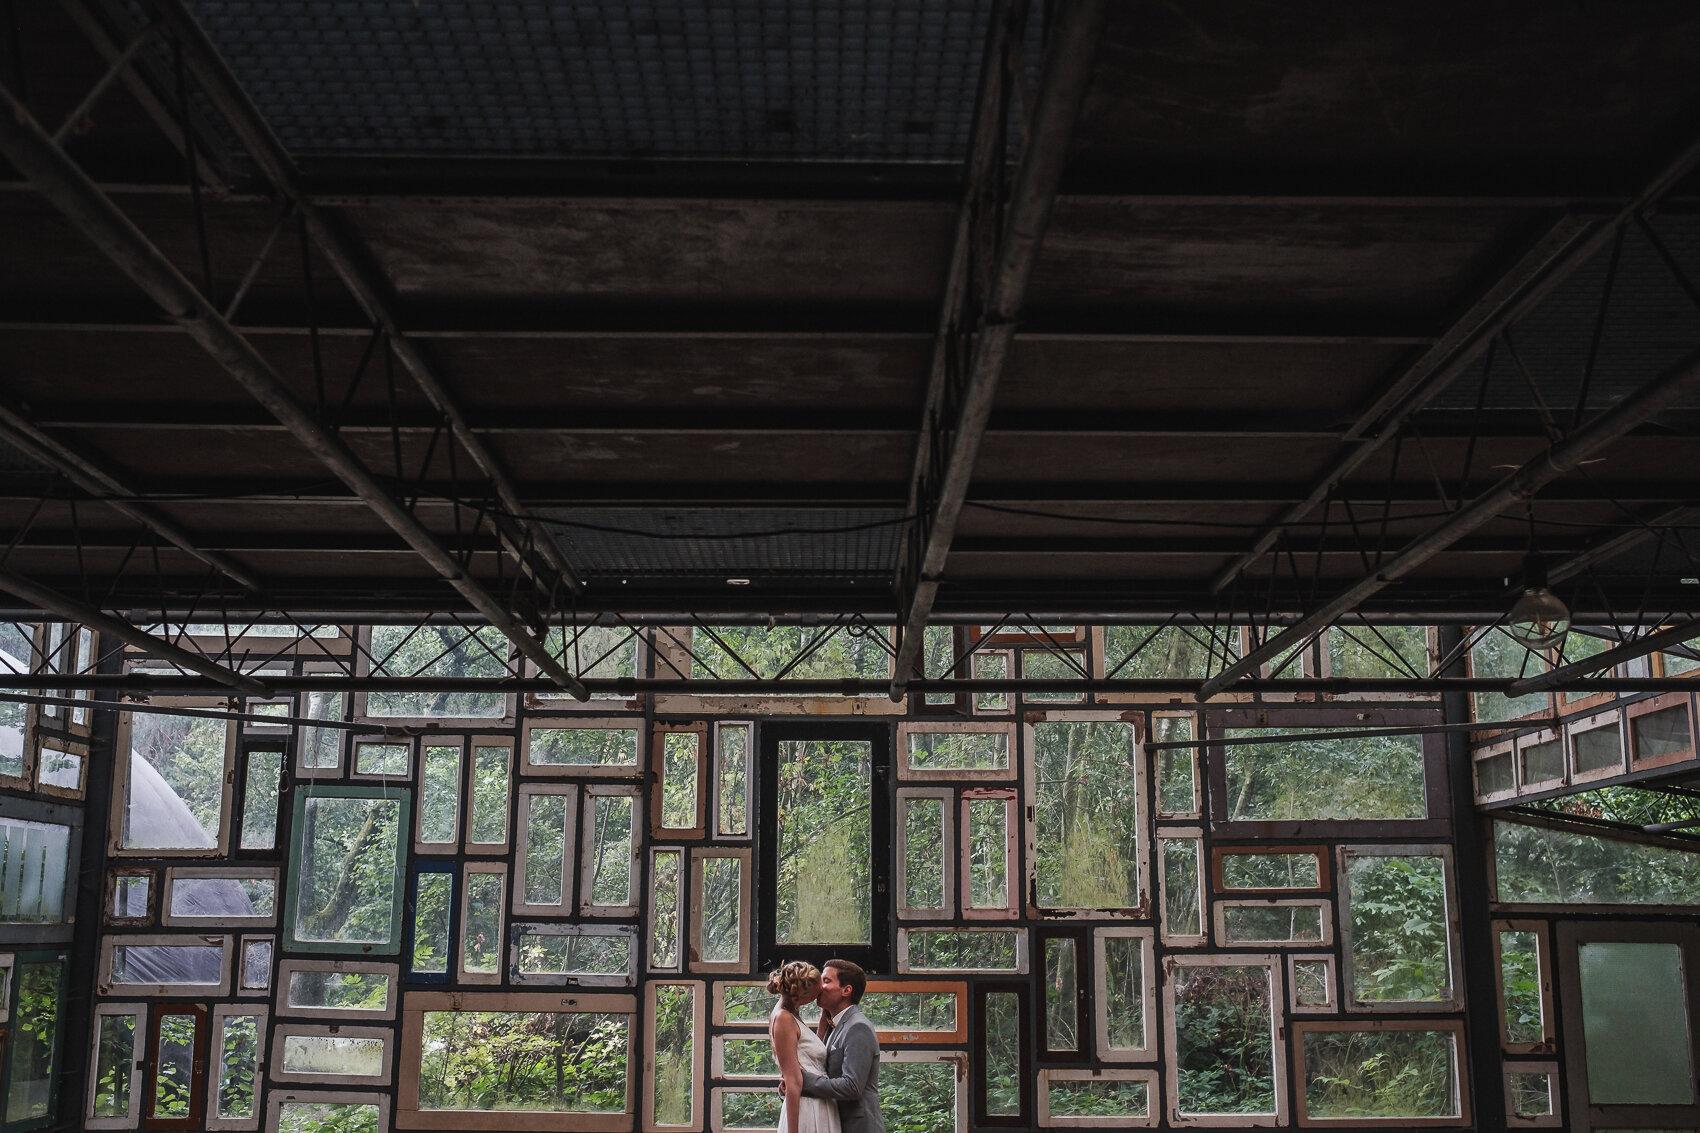 iso800 - huwelijksfotograaf isabo matthias verbeke foundation-11.jpg